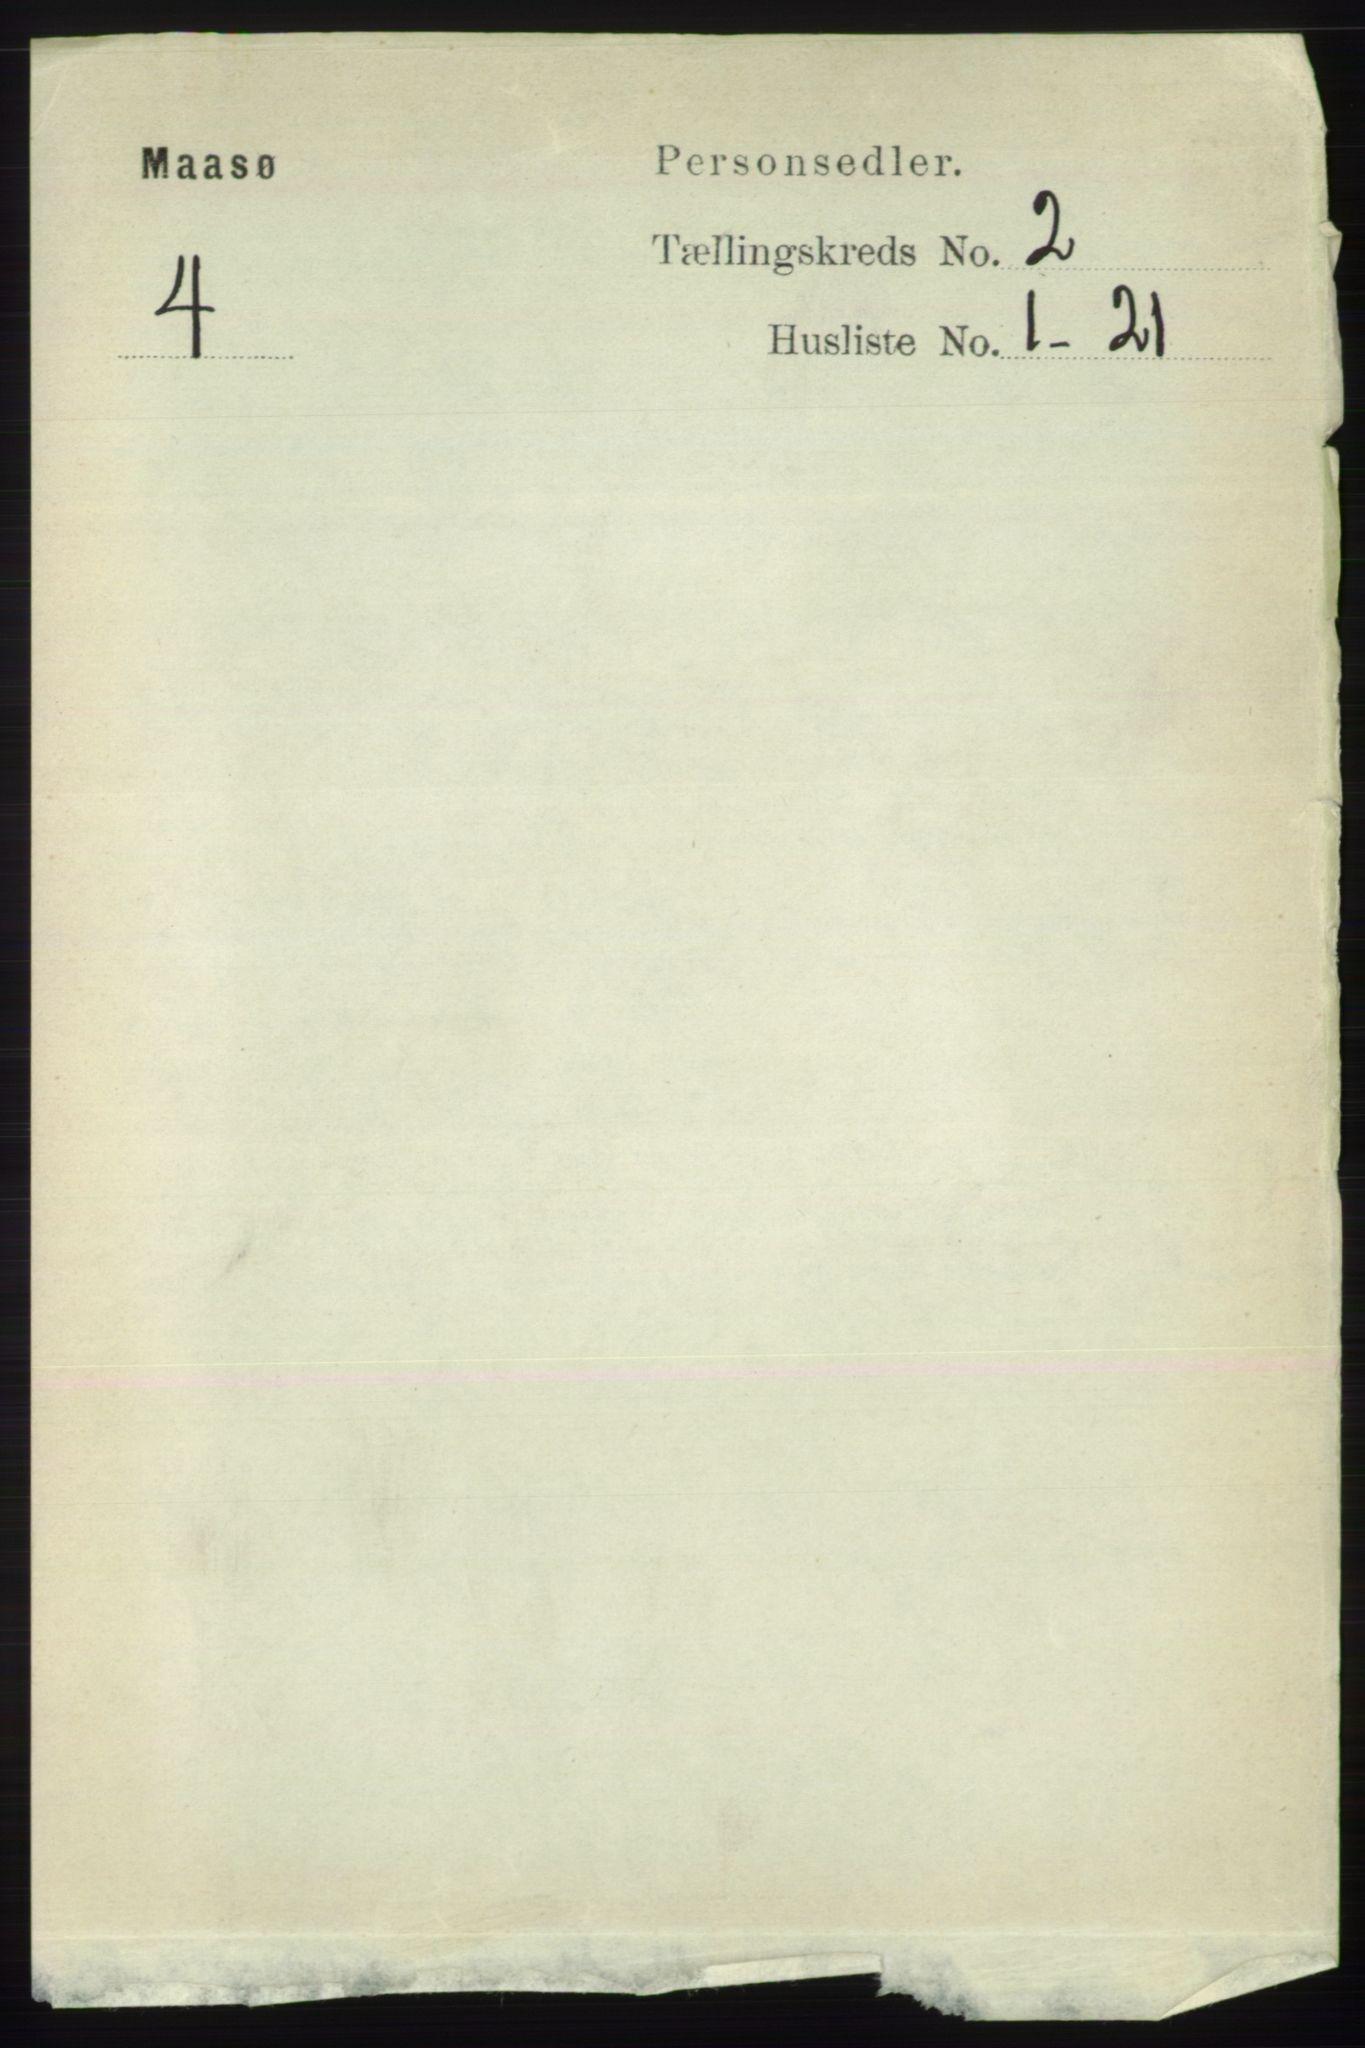 RA, Folketelling 1891 for 2018 Måsøy herred, 1891, s. 240